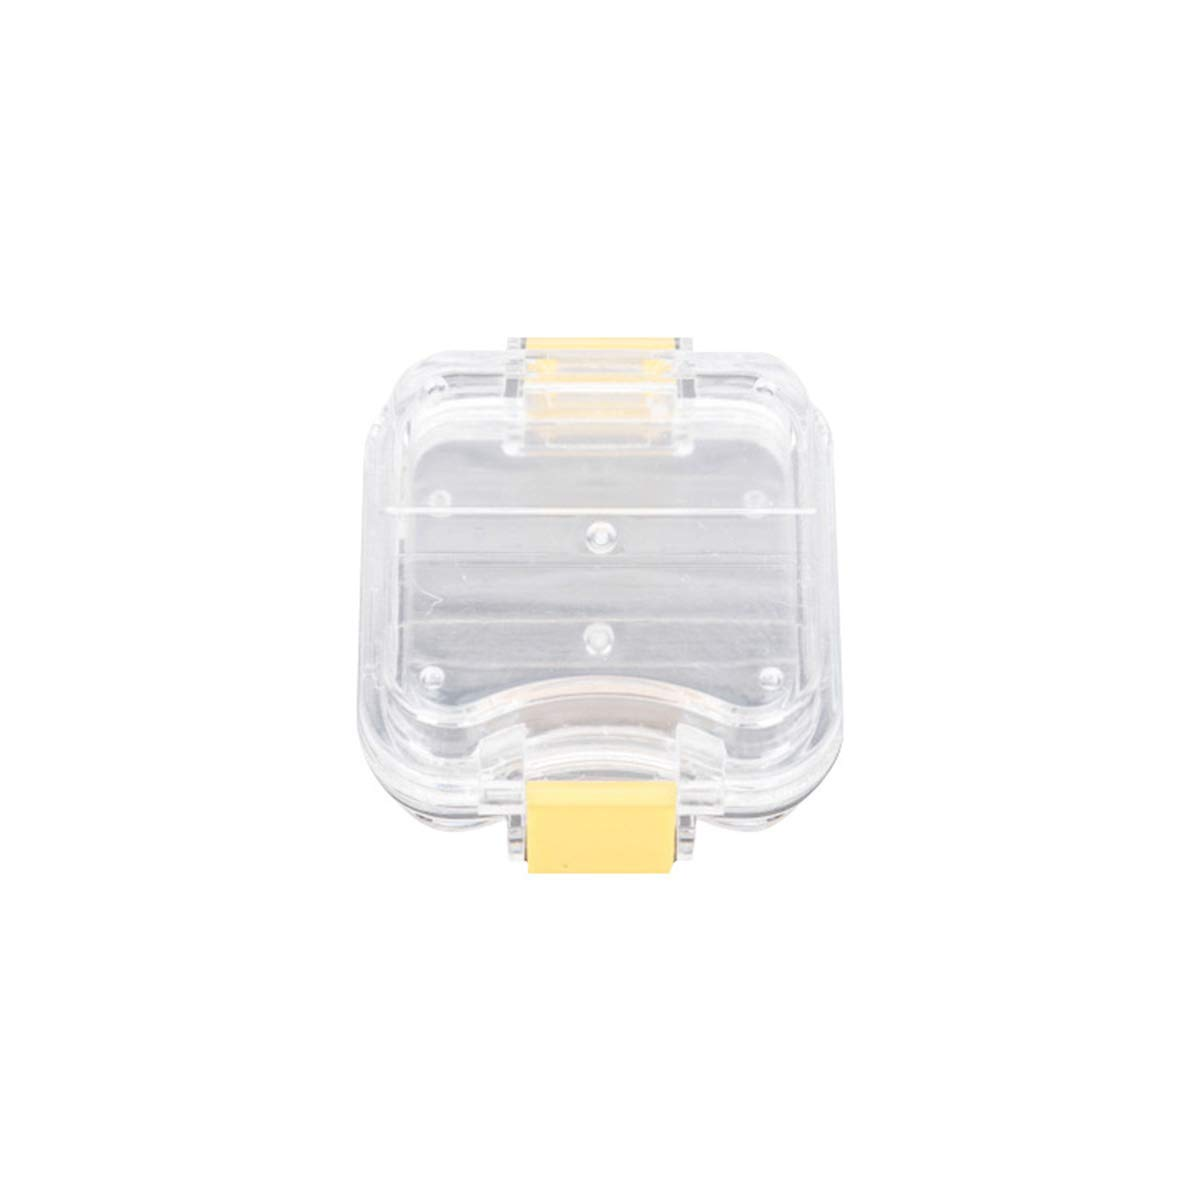 TJIRIS Transparent Membrane Box Teeth Crown Box Denture Rentain Case 1000 Pieces